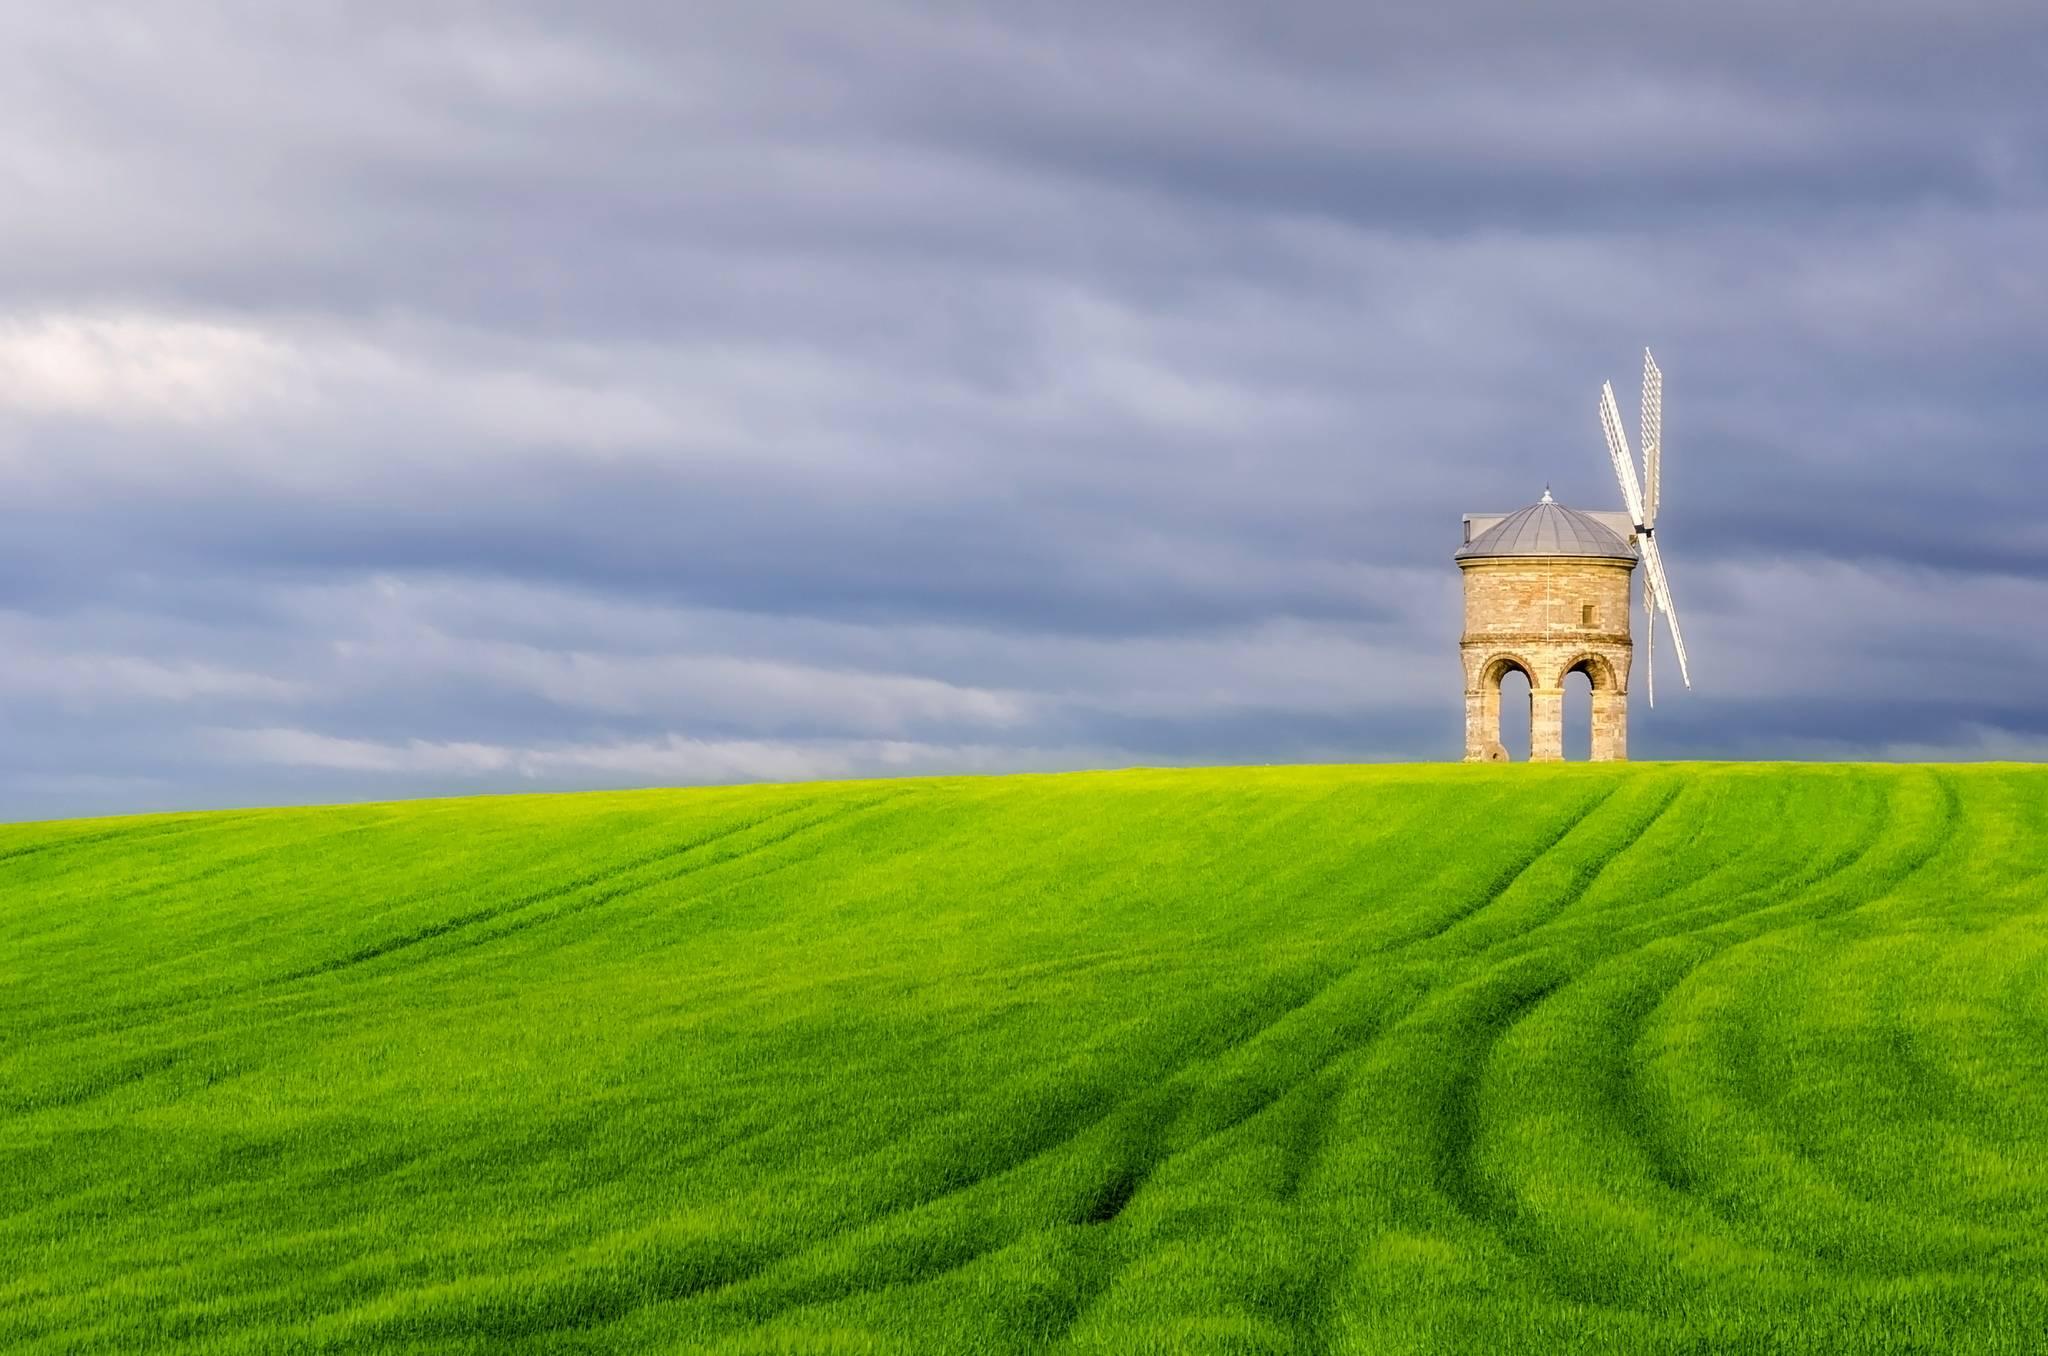 Честертон ветряная мельница, Уорикшир, Великобритания